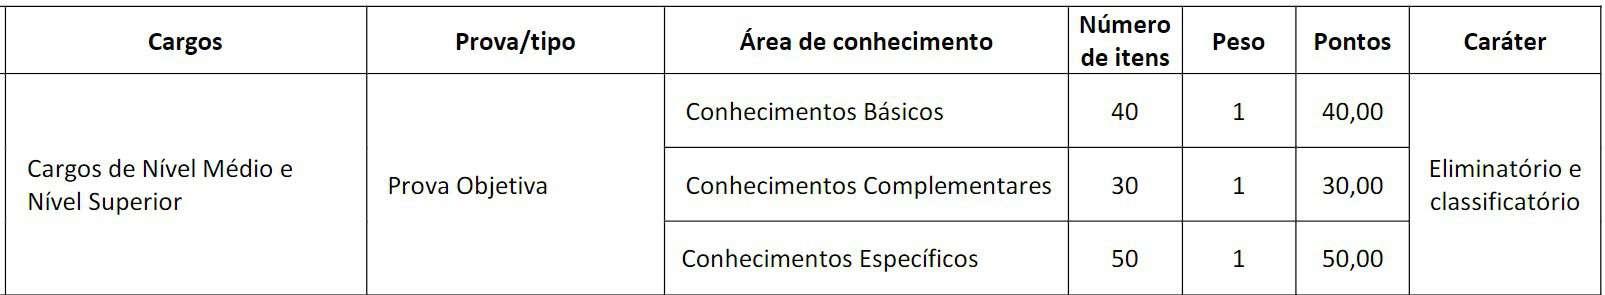 pt3 2 - Concurso CRP MS 2020: Provas Marcadas pro dia 07/03/2021 !